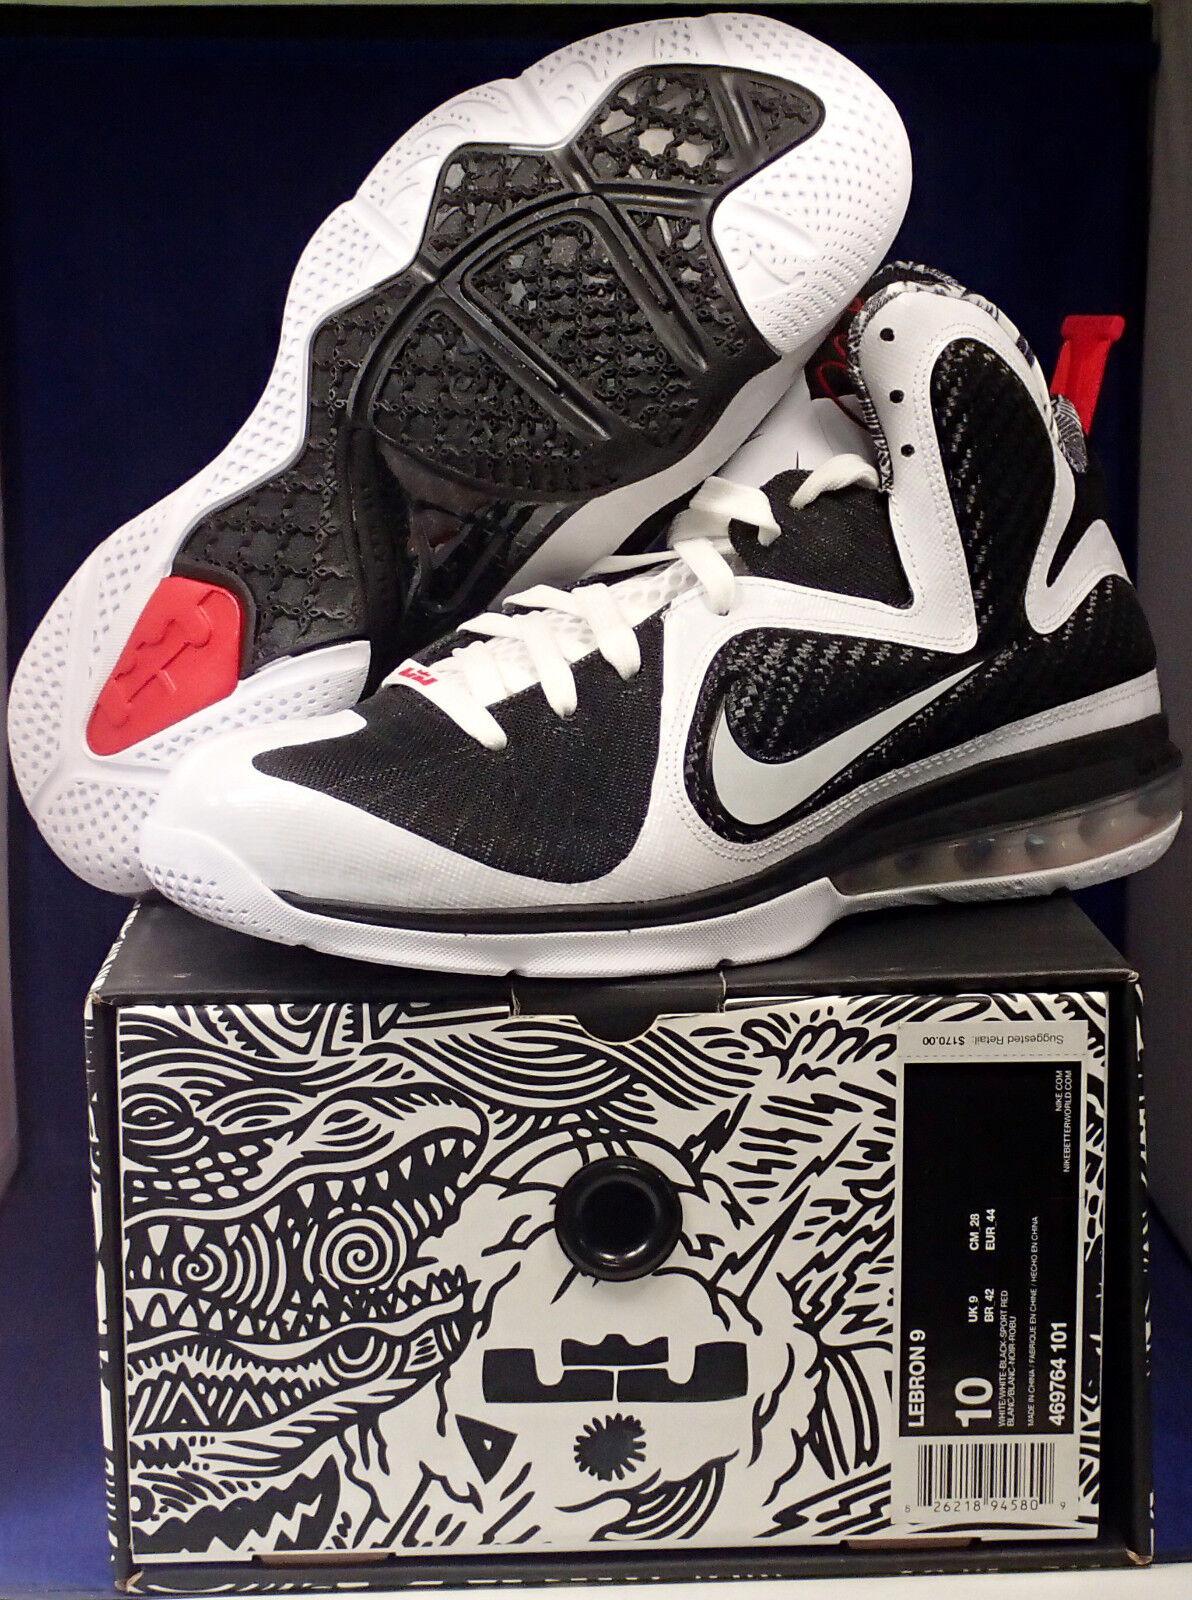 brand new 2a803 ce527 2018 Nike Lebron 9 IX Freegums Miami Exclusive Collector Box SZ 10